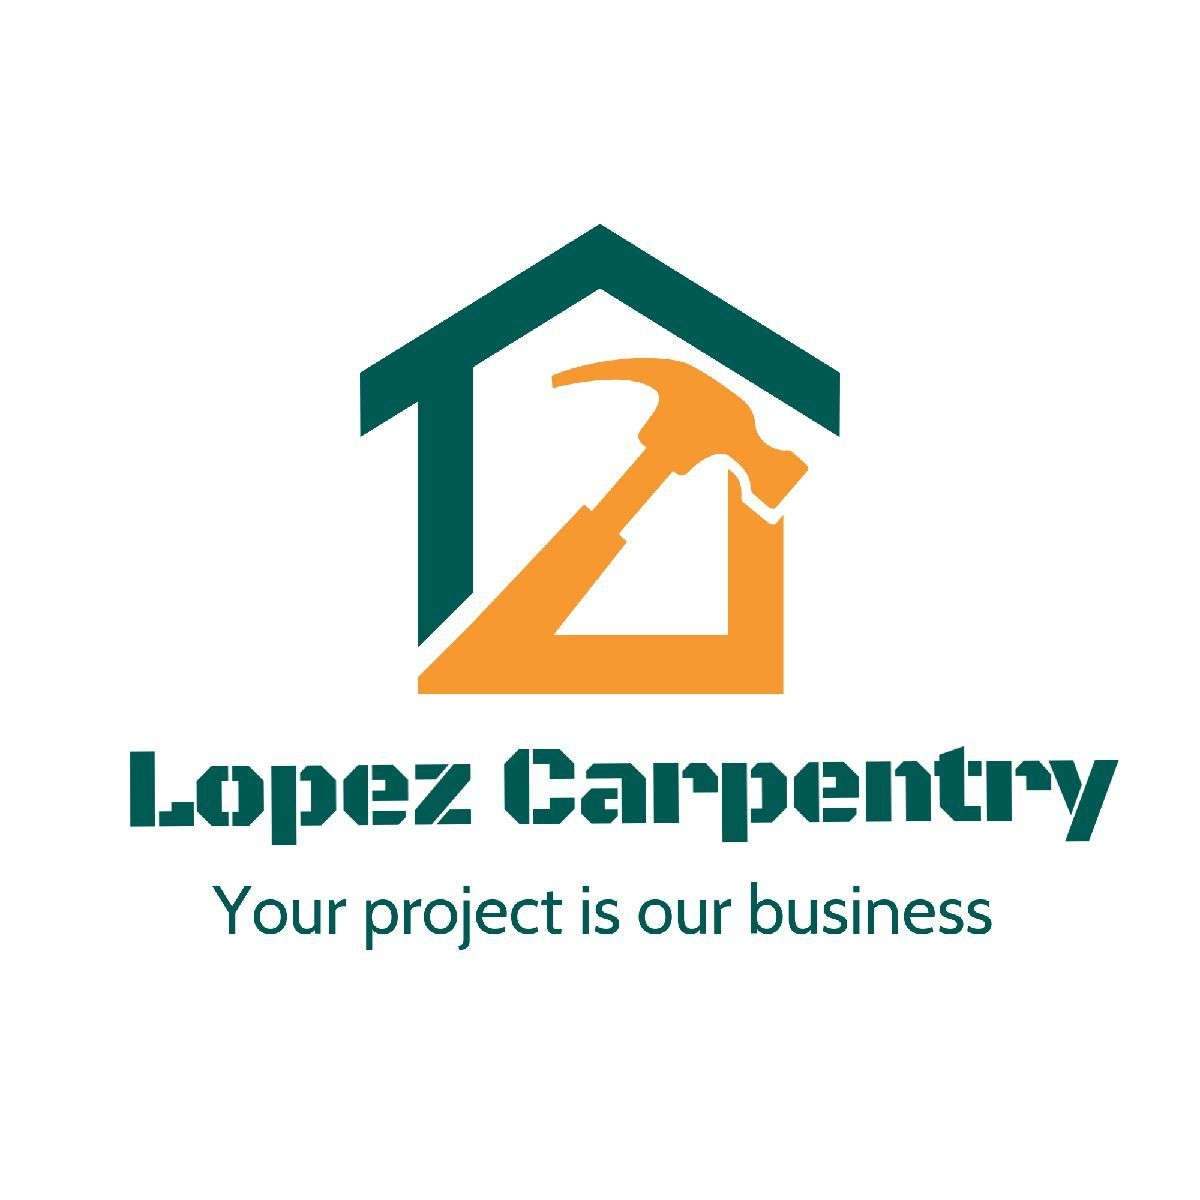 Lopez Carpentry